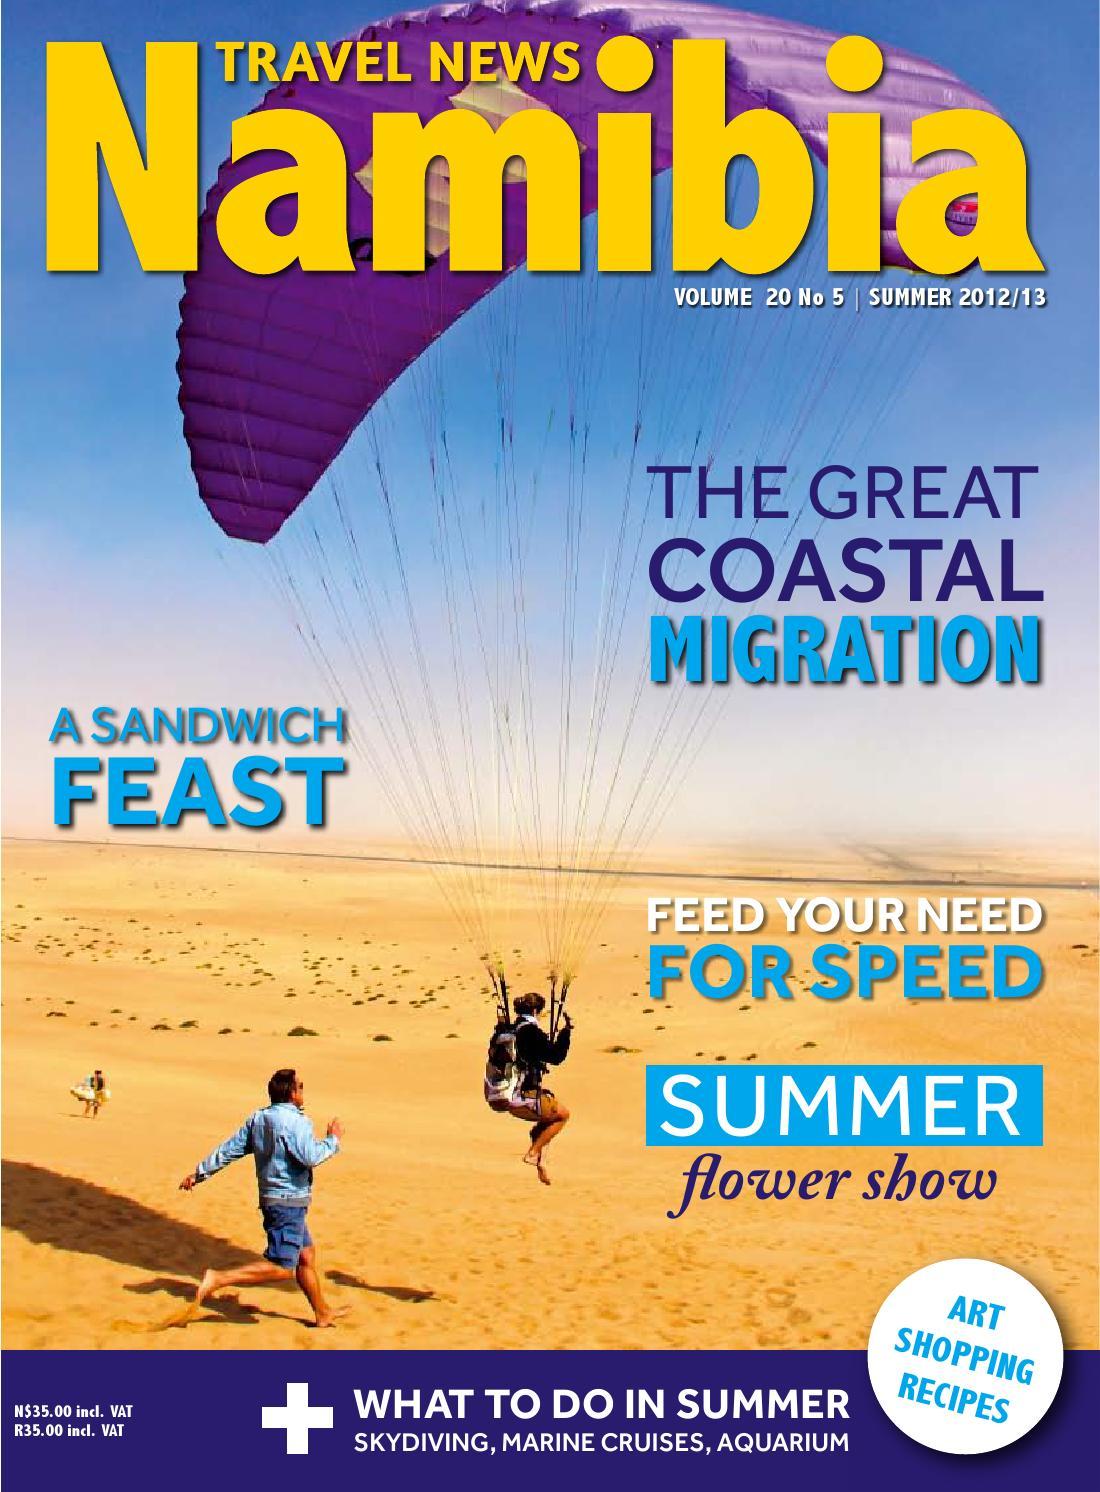 Science Map Satellite Brandberg Massif Namibia Desert Canvas Art Print